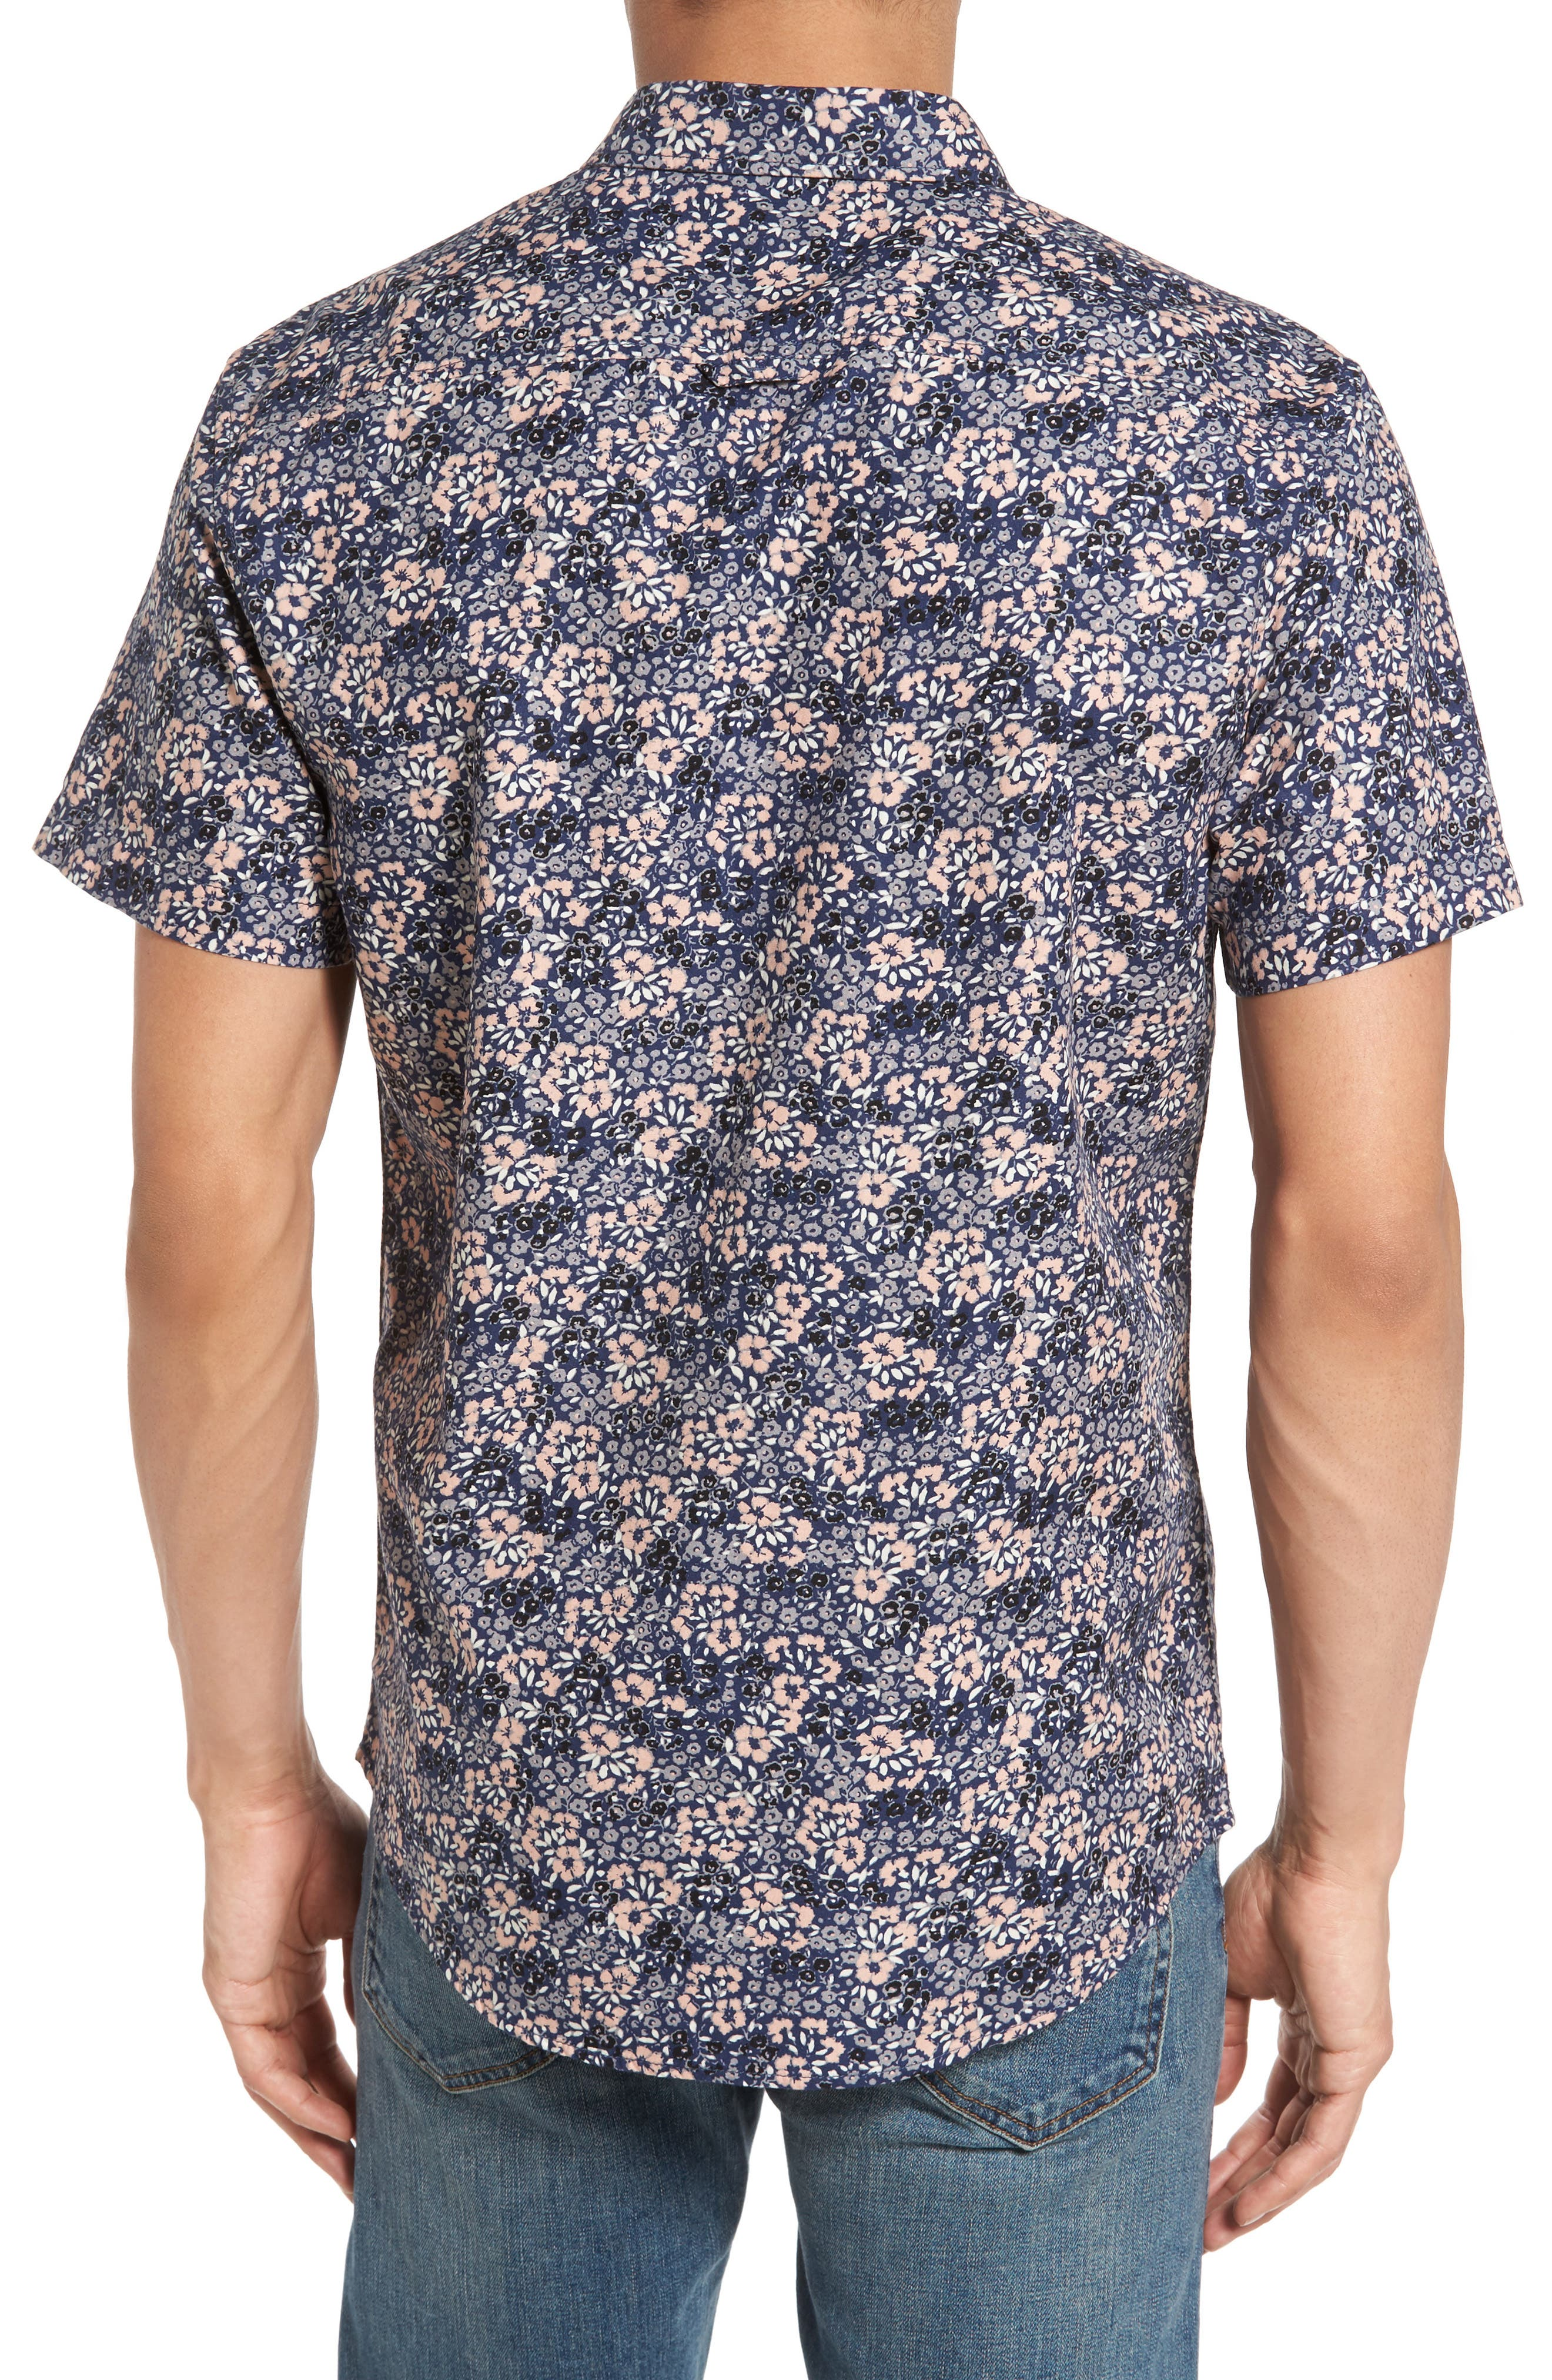 Poplin Floral Shirt,                             Alternate thumbnail 2, color,                             Navy Peacoat Simple Floral